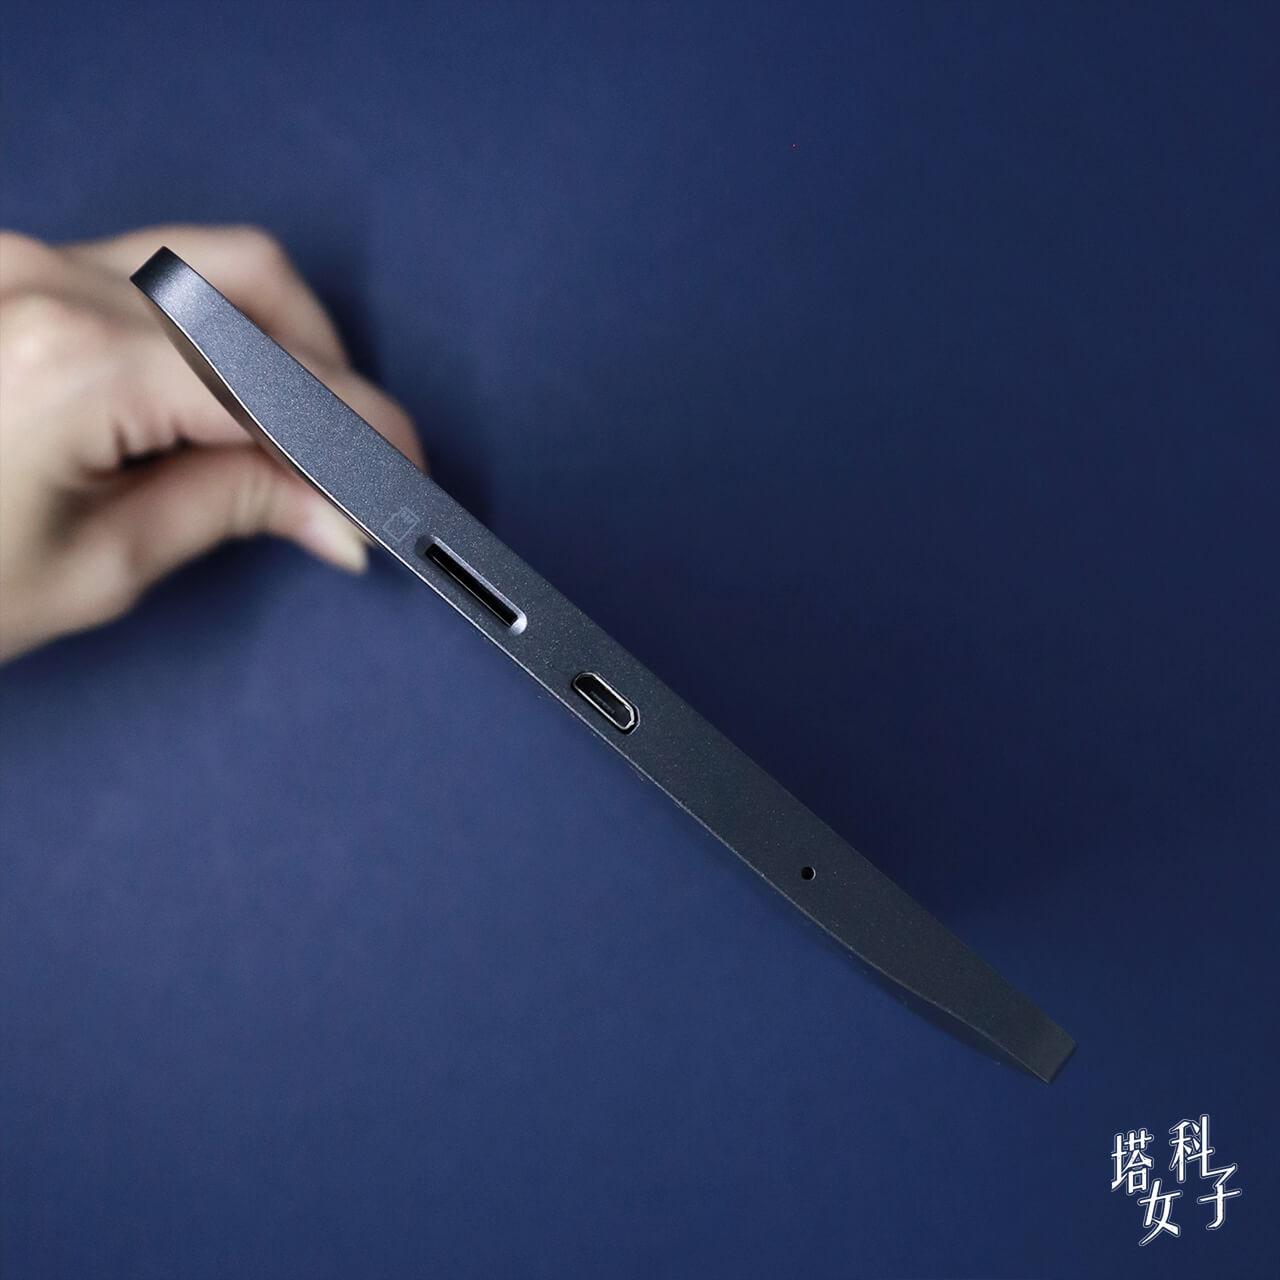 Mobiscribe 電子筆記本+閱讀器 機身弧度